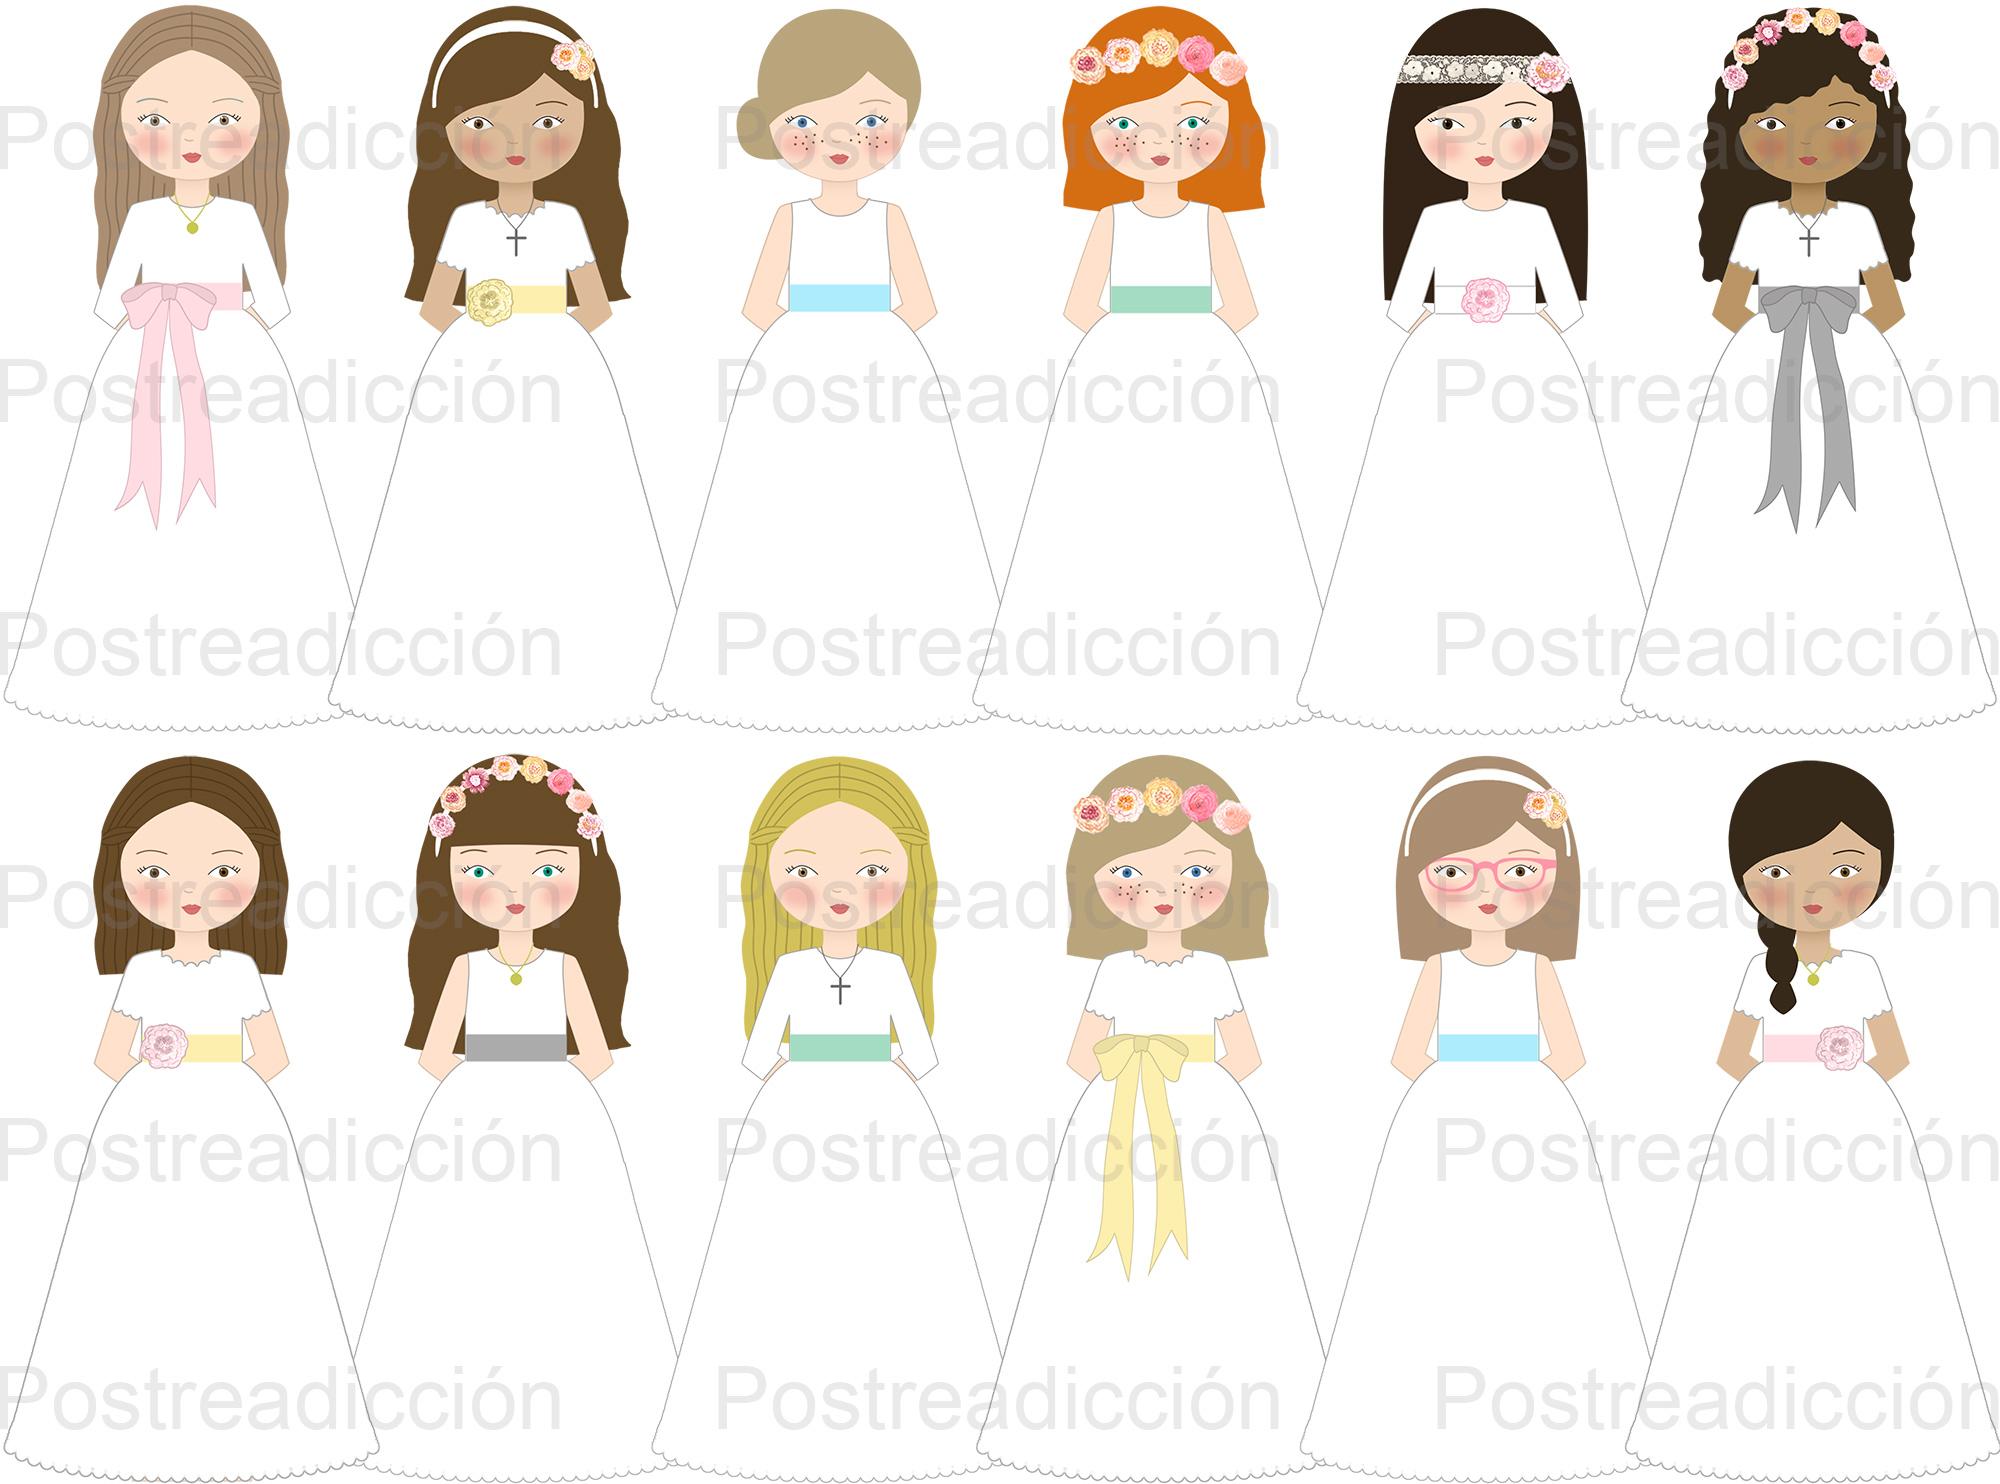 Imagen de producto: https://tienda.postreadiccion.com/img/articulos/secundarias6603-modelo-no-784-nina-de-comunion-carlota-1.jpg